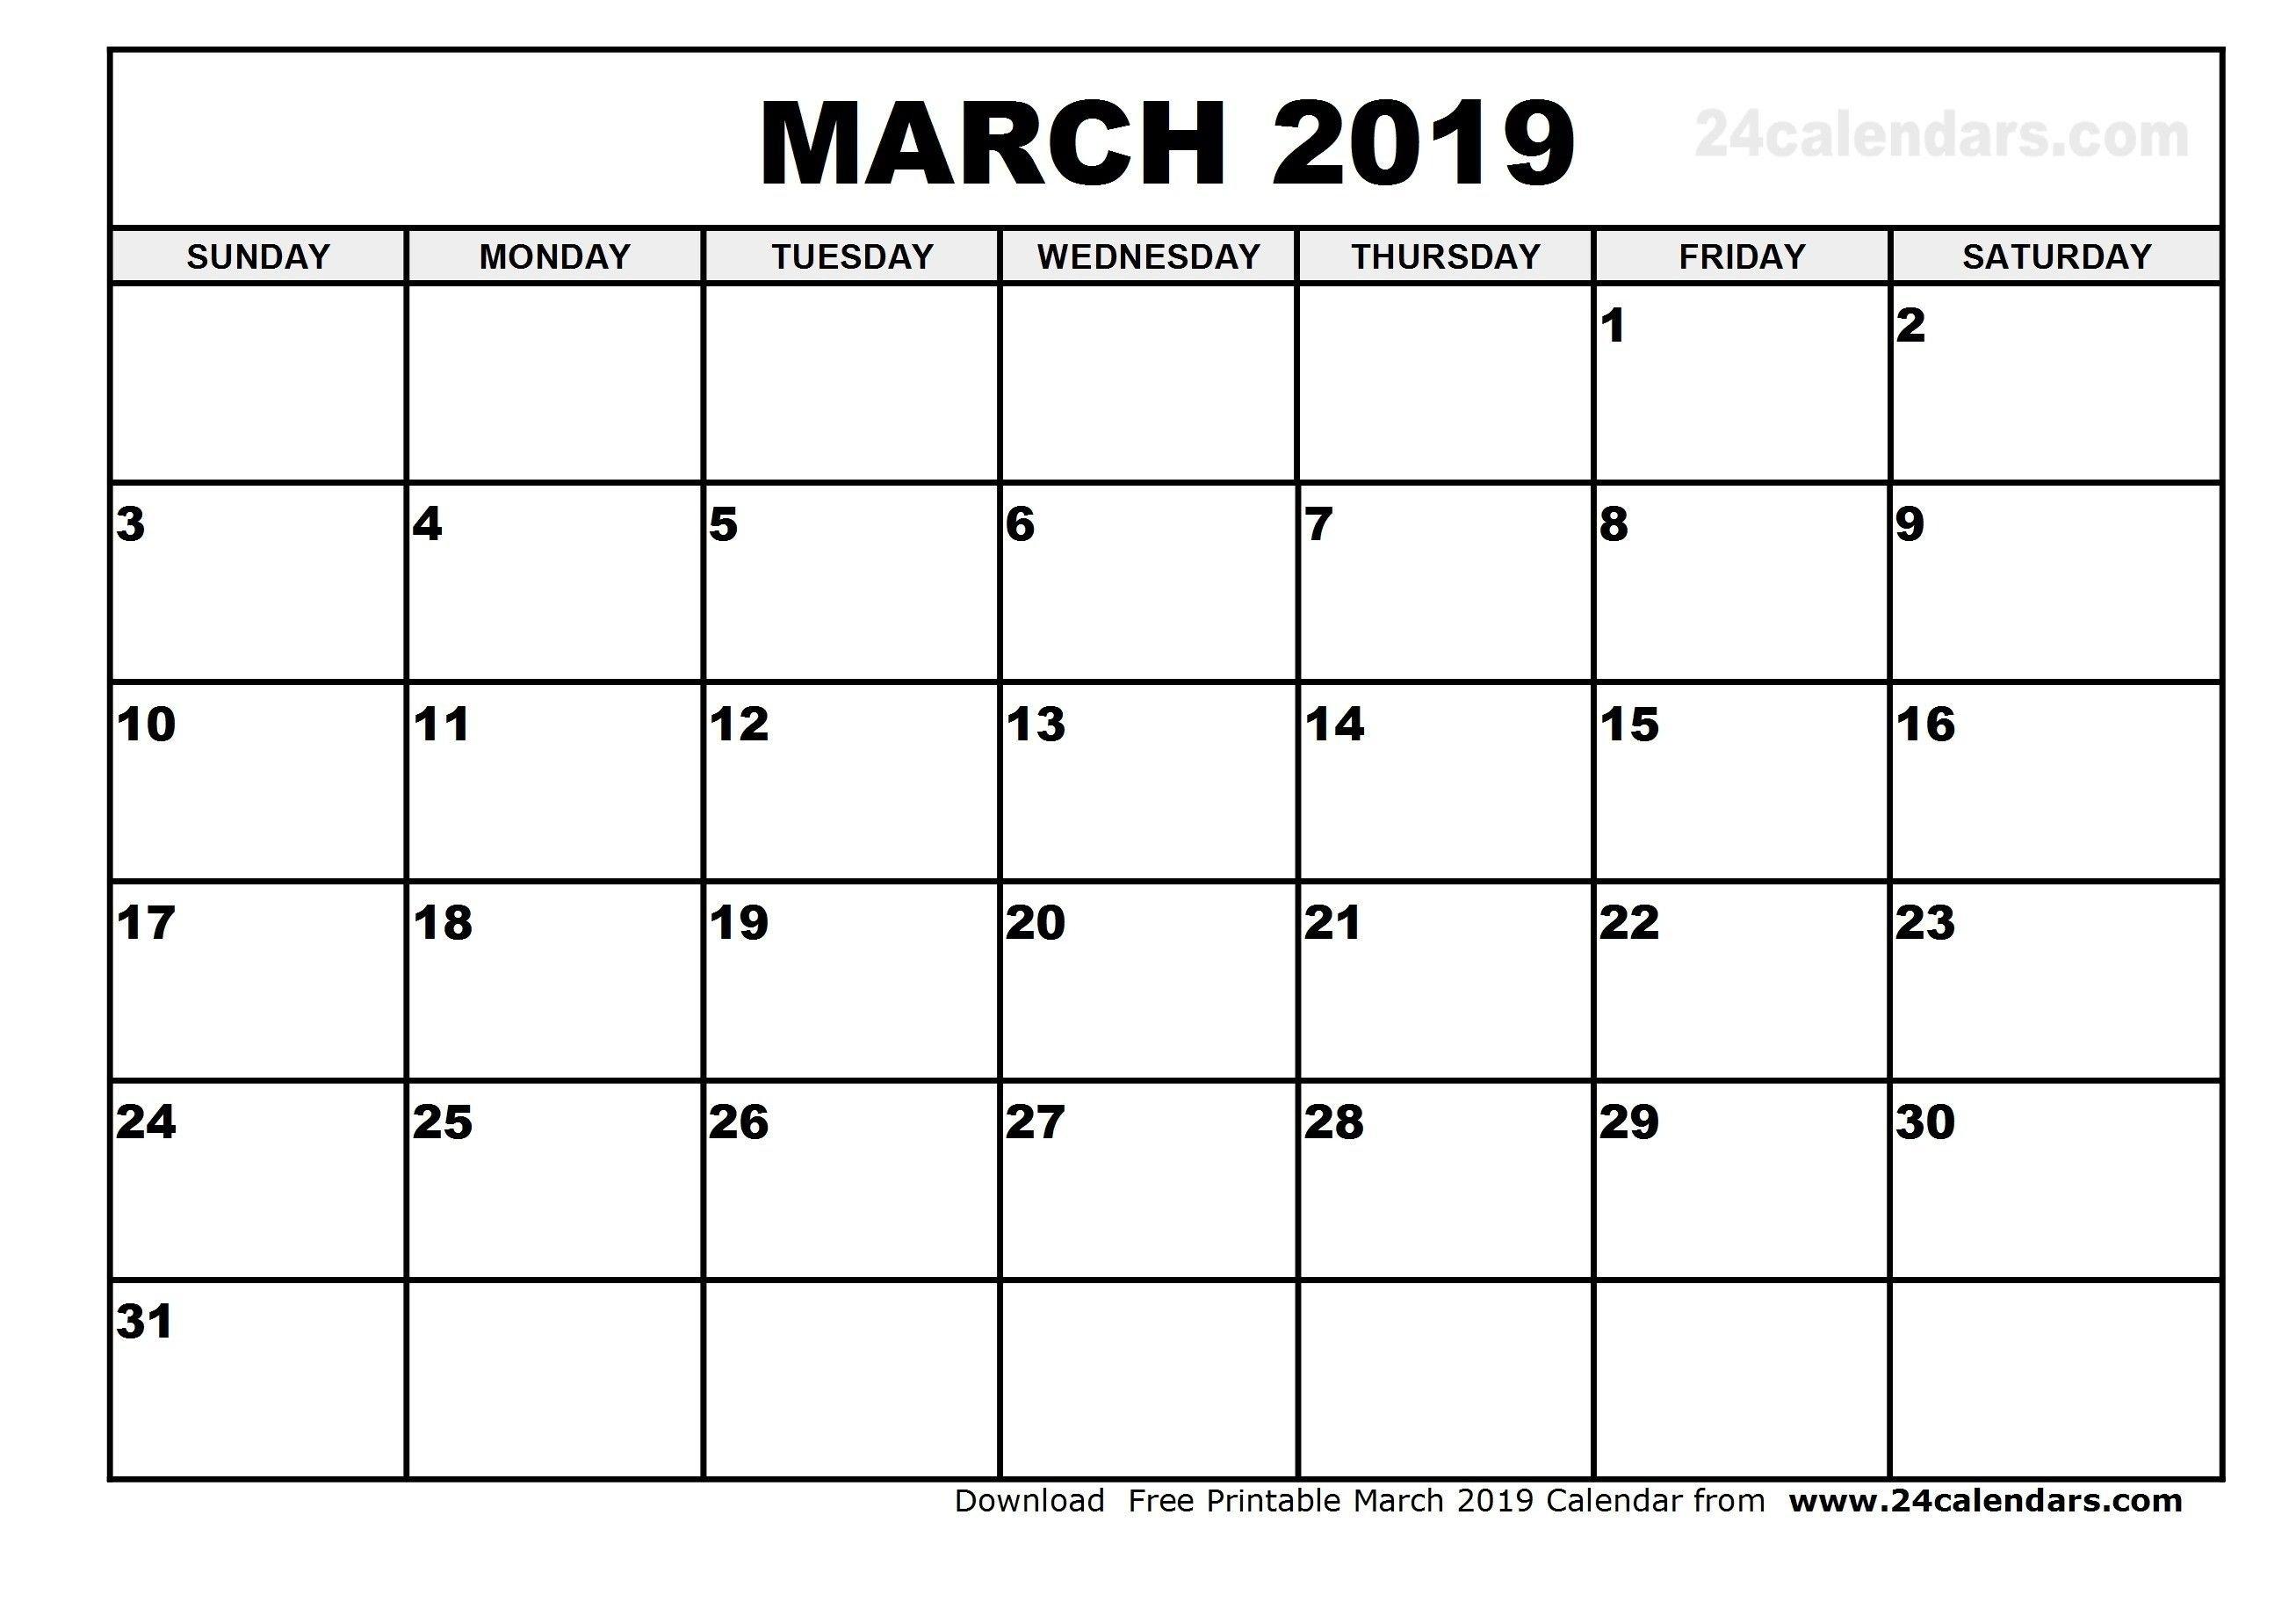 March 4 2019 Calendar | Calendar Format Example March 4 2019 Calendar